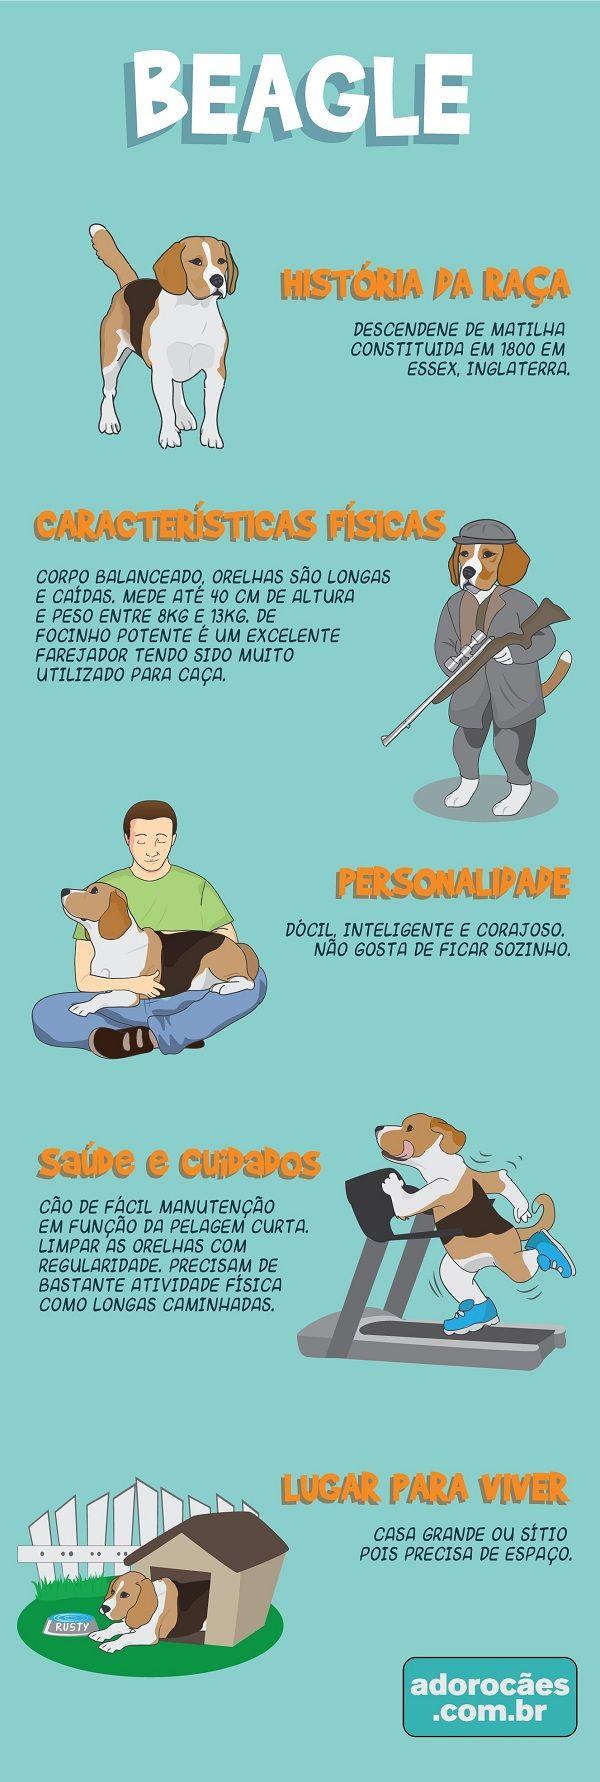 Beagle: história da raça, características físicas, personalidade, temperamento, saúde e cuidados, lugar para viver